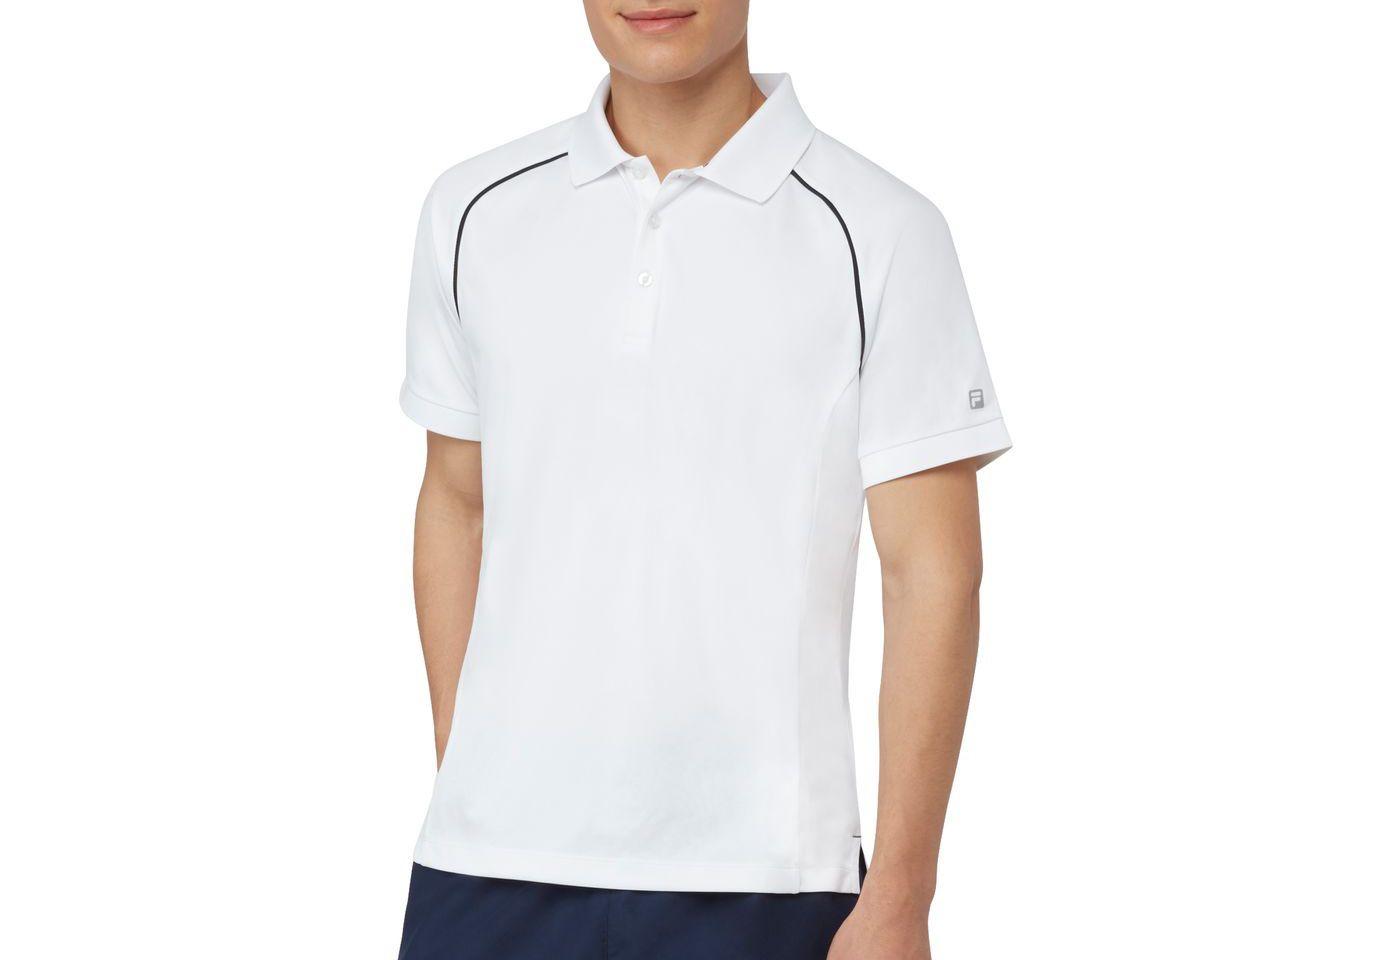 Fila Men's Piped Tennis Polo